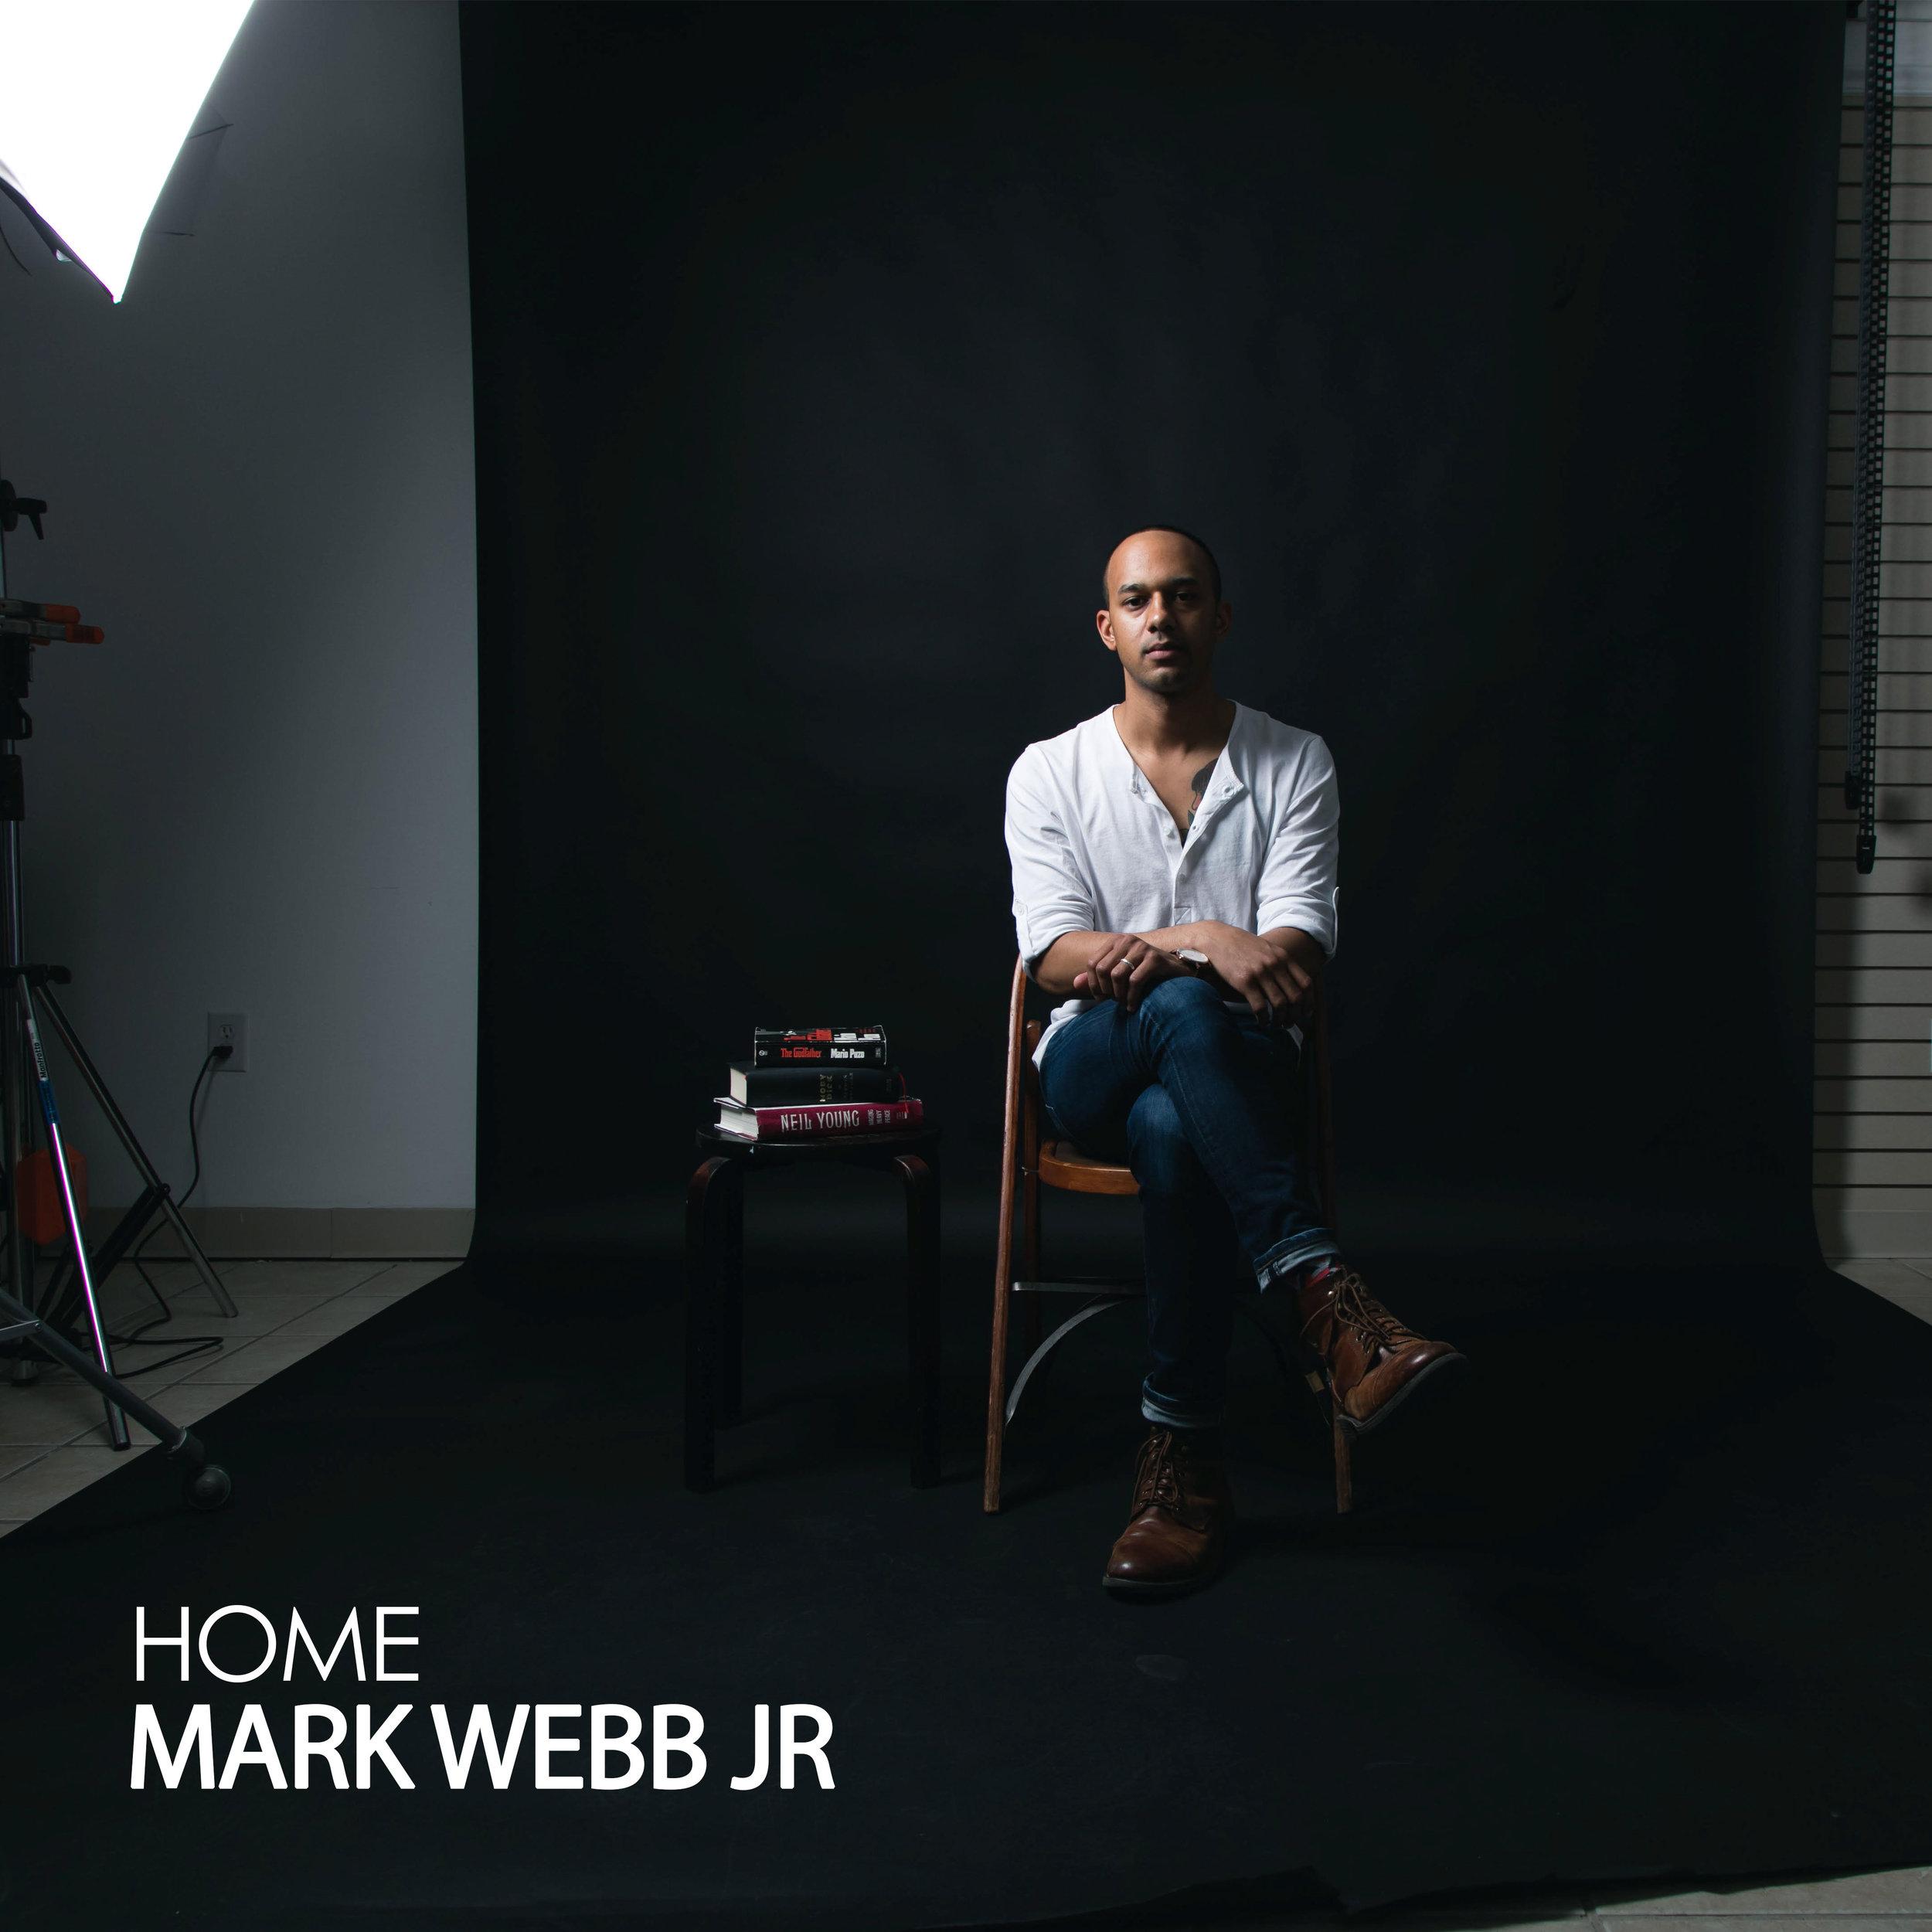 markwebb_HOME.jpg